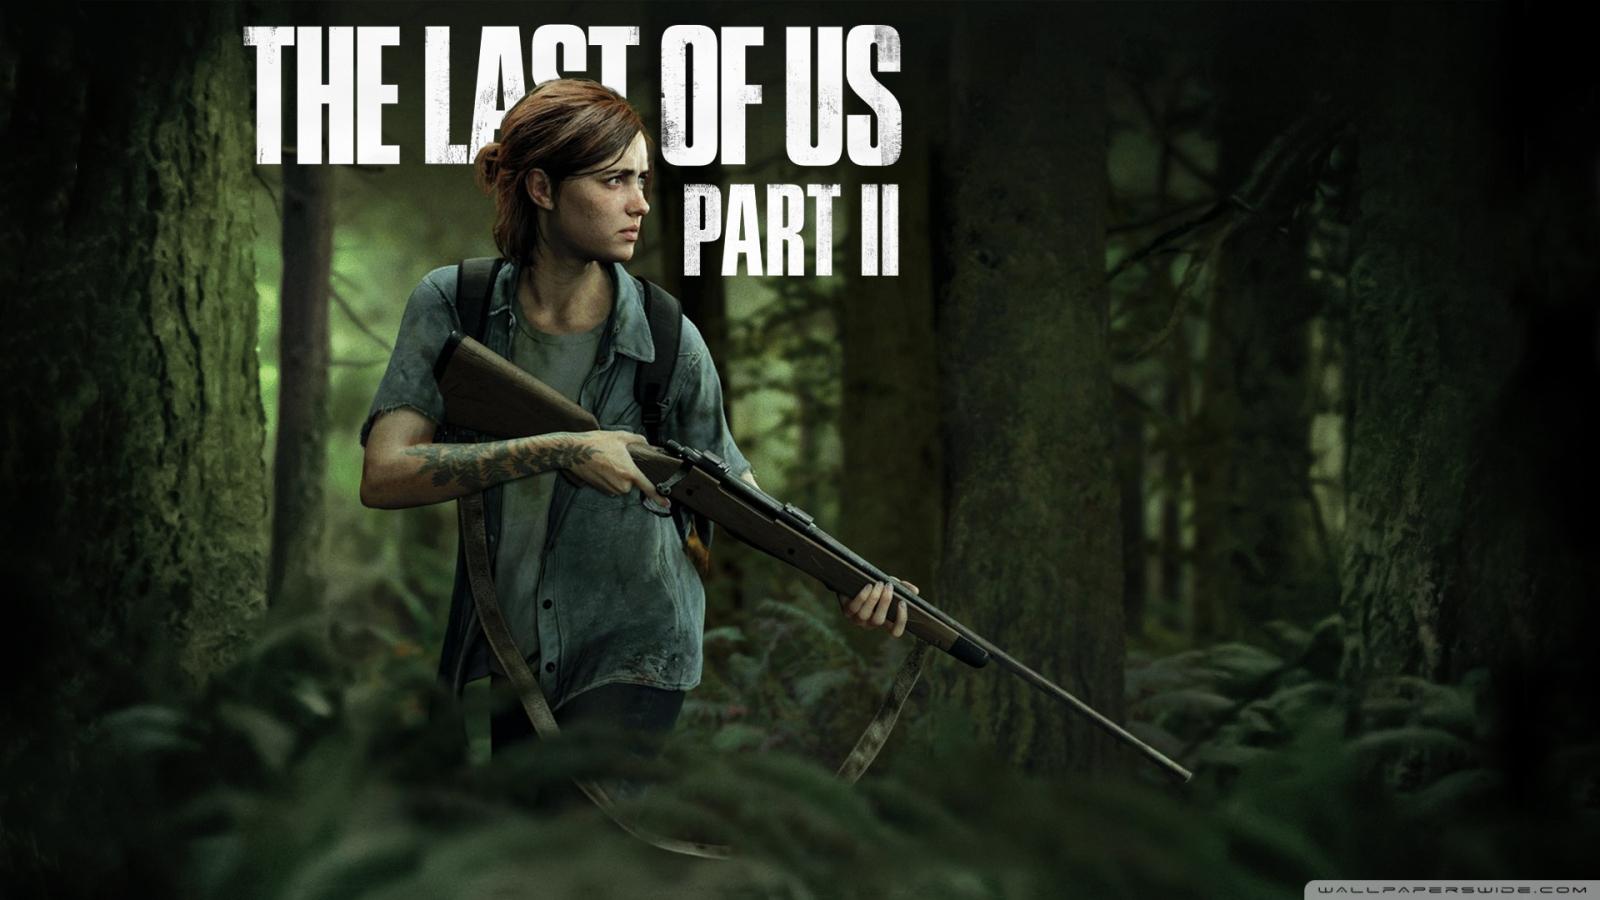 Free Download The Last Of Us Part 2 4k Hd Desktop Wallpaper For 4k